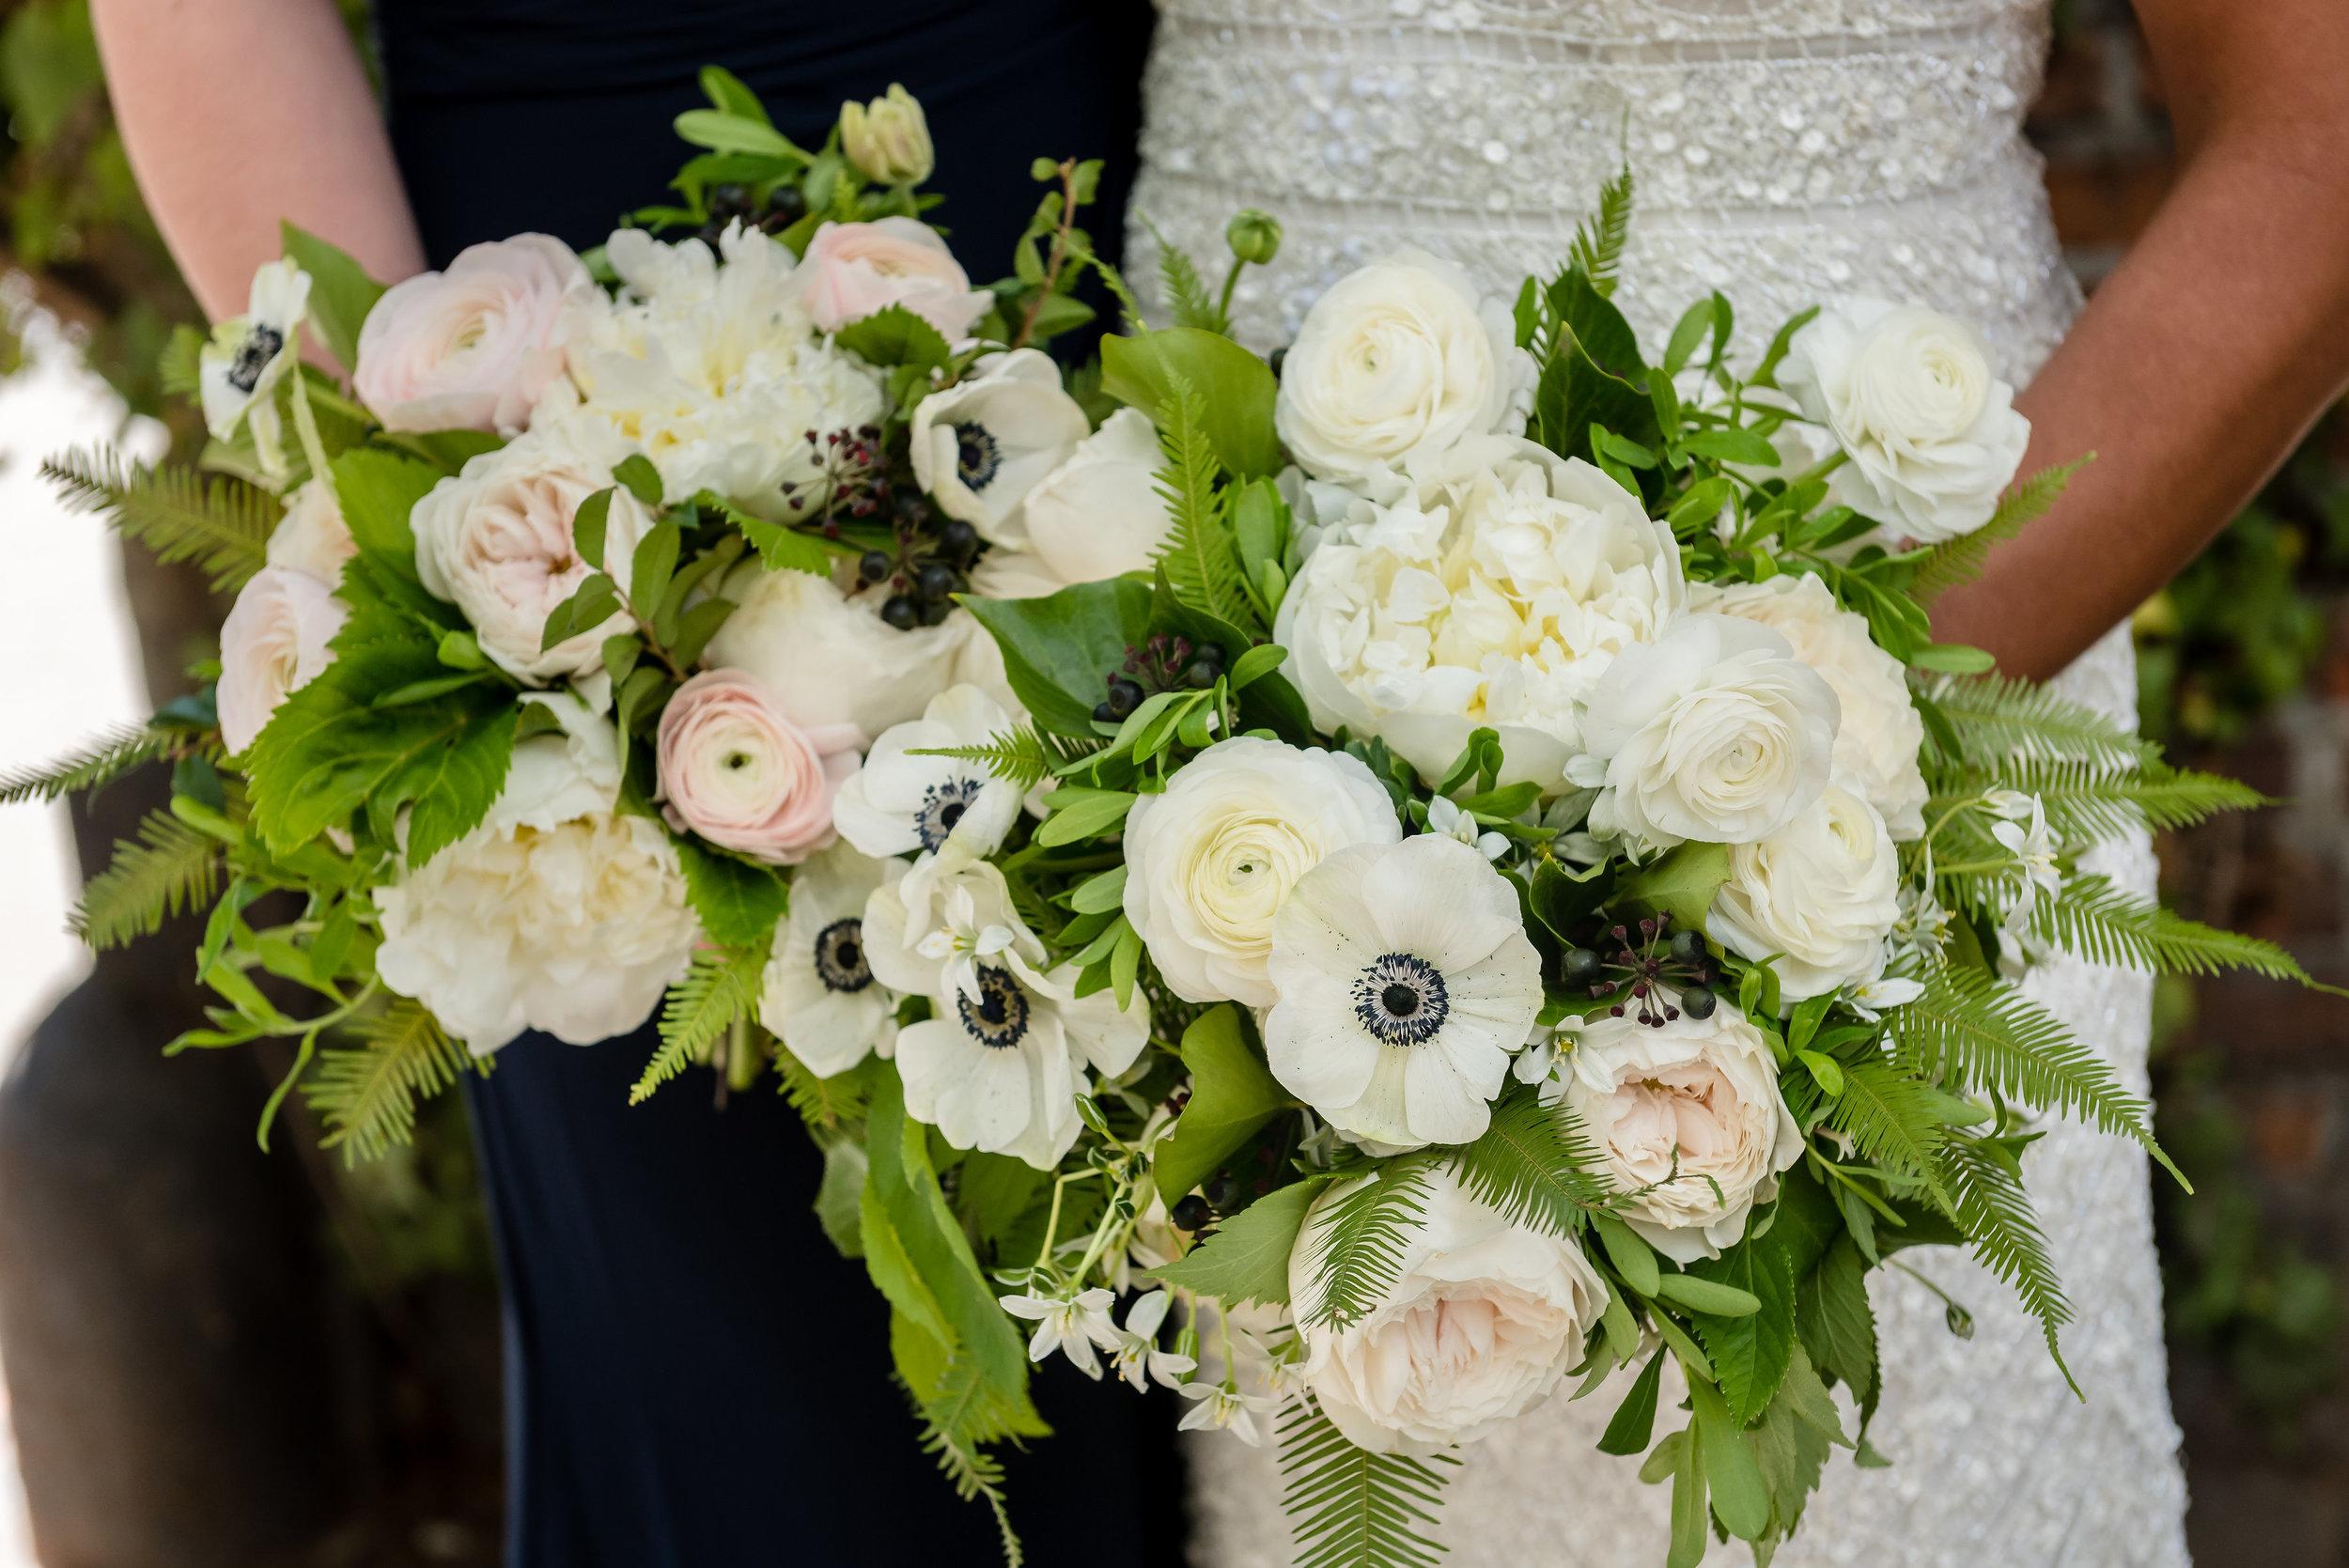 Green White and Blush Wedding Bouquet.jpg